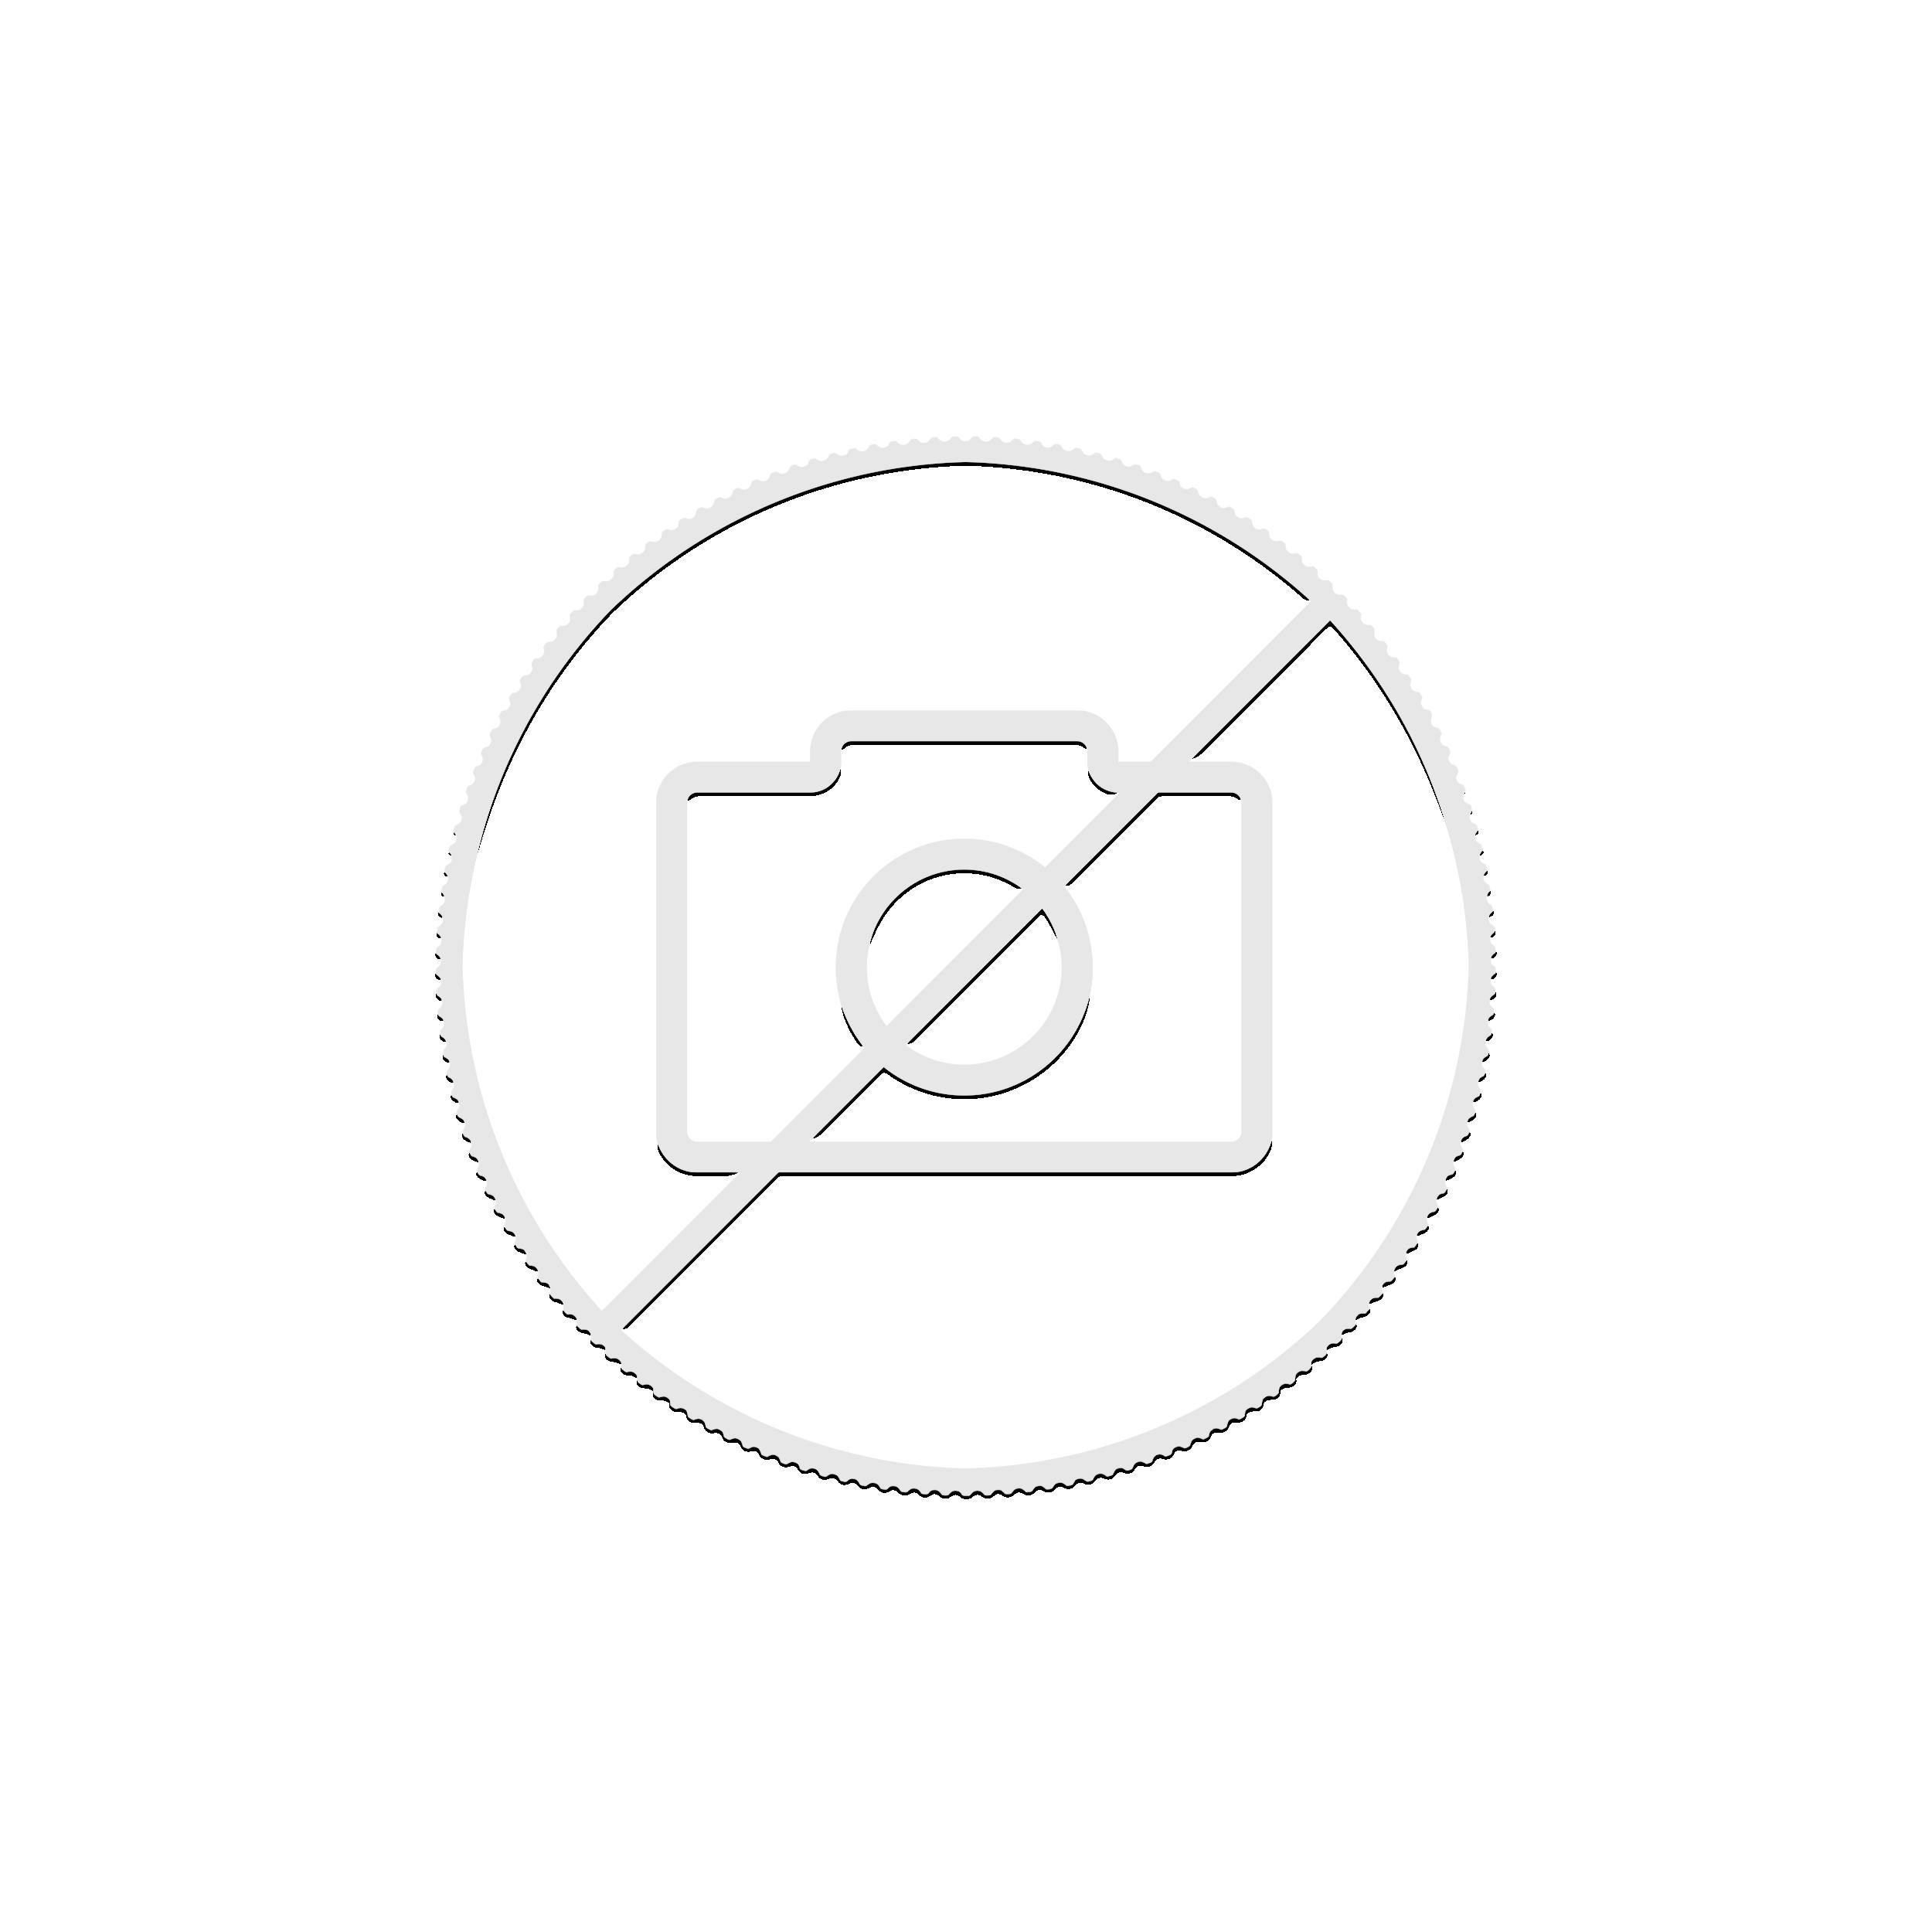 1/4 Troy ounce gold coin Philharmonic